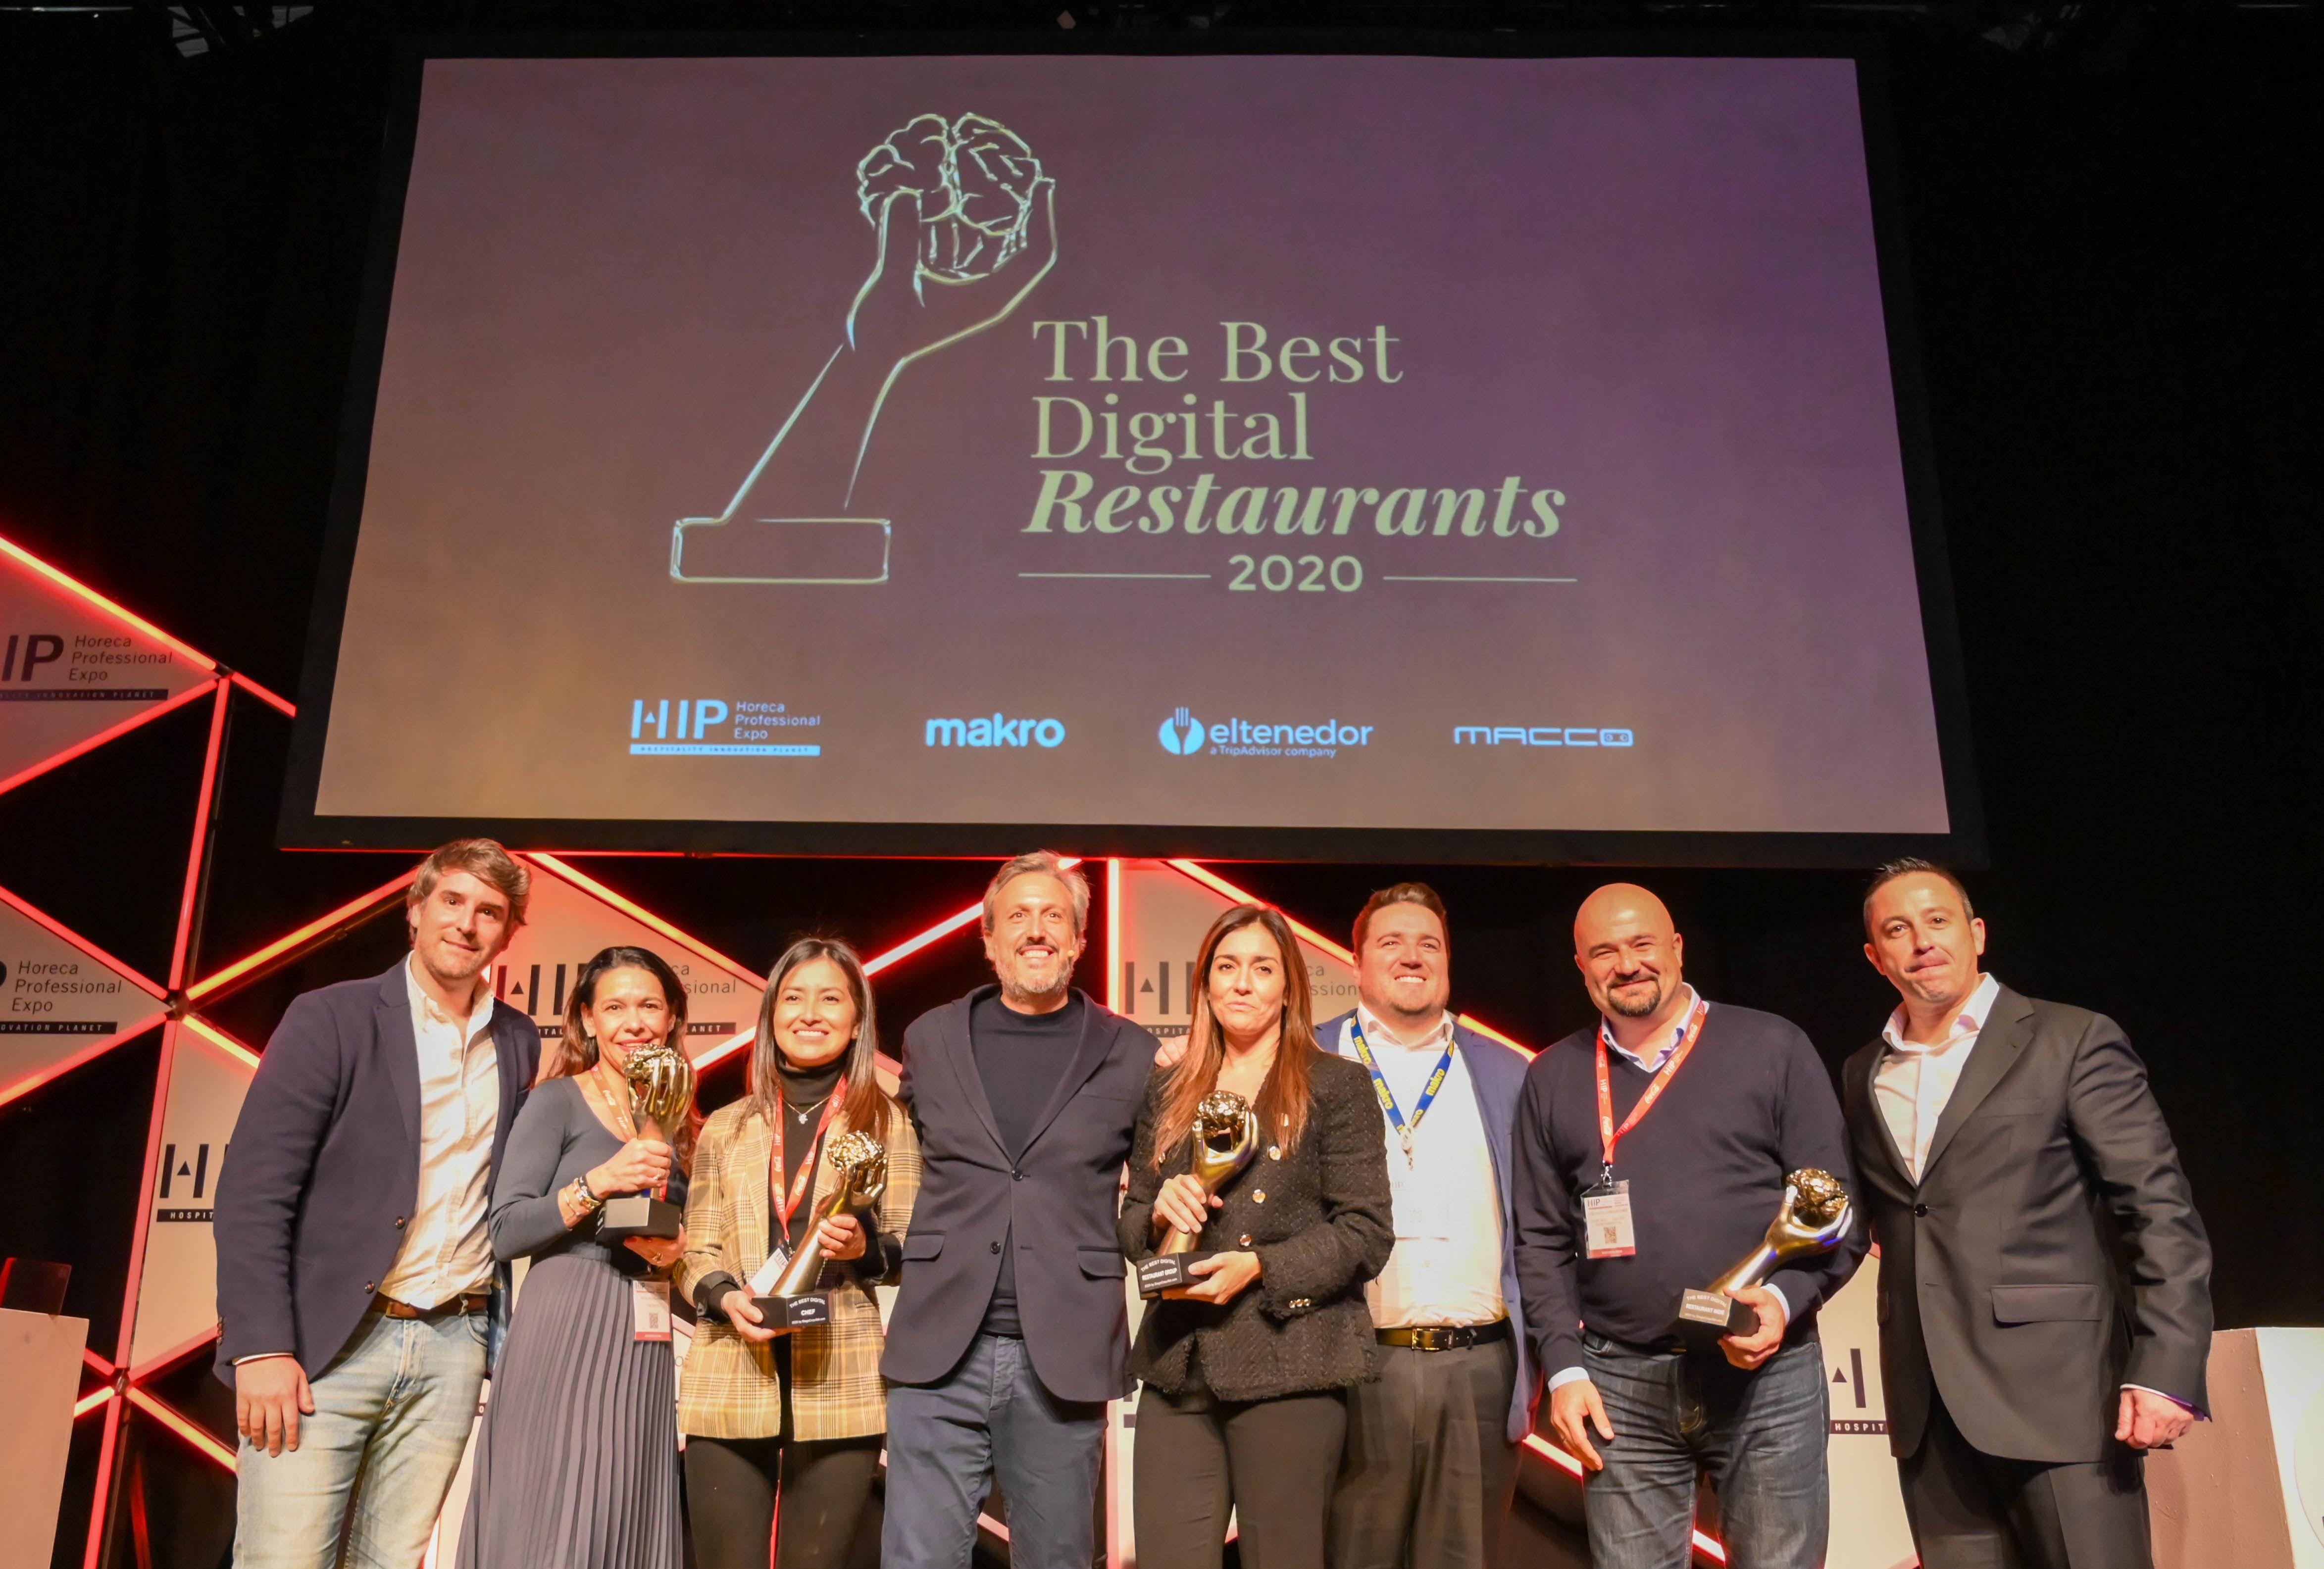 Jordi Roca, Iratxe Miranda, McDonald's y Heart Ibiza ganan los premios The Best Digital Restaurants 2020